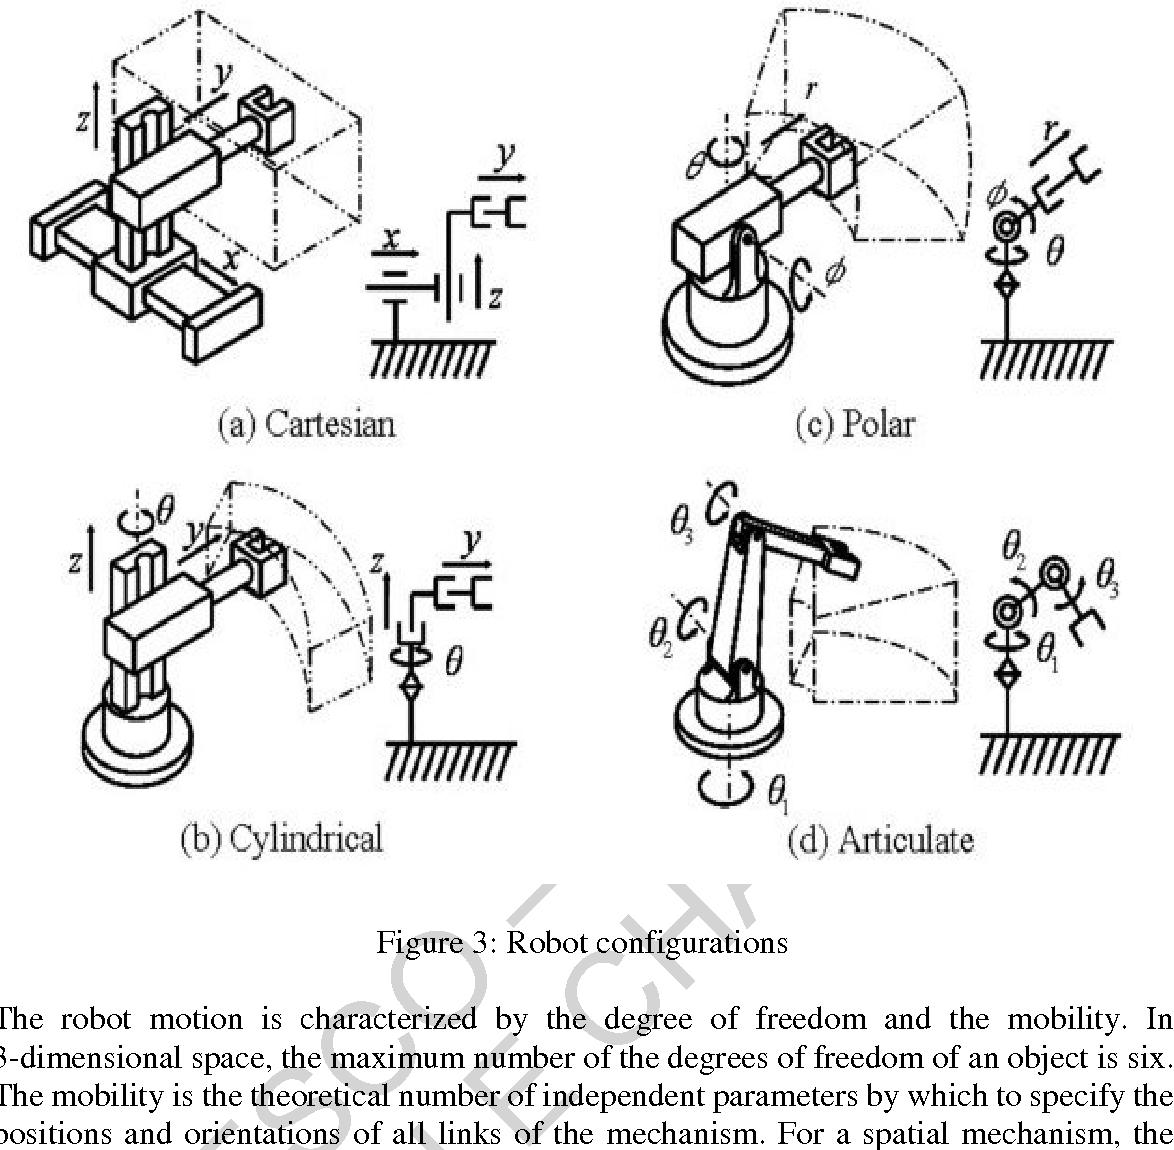 PDF] ROBOT KINEMATICS AND DYNAMICS - Semantic Scholar